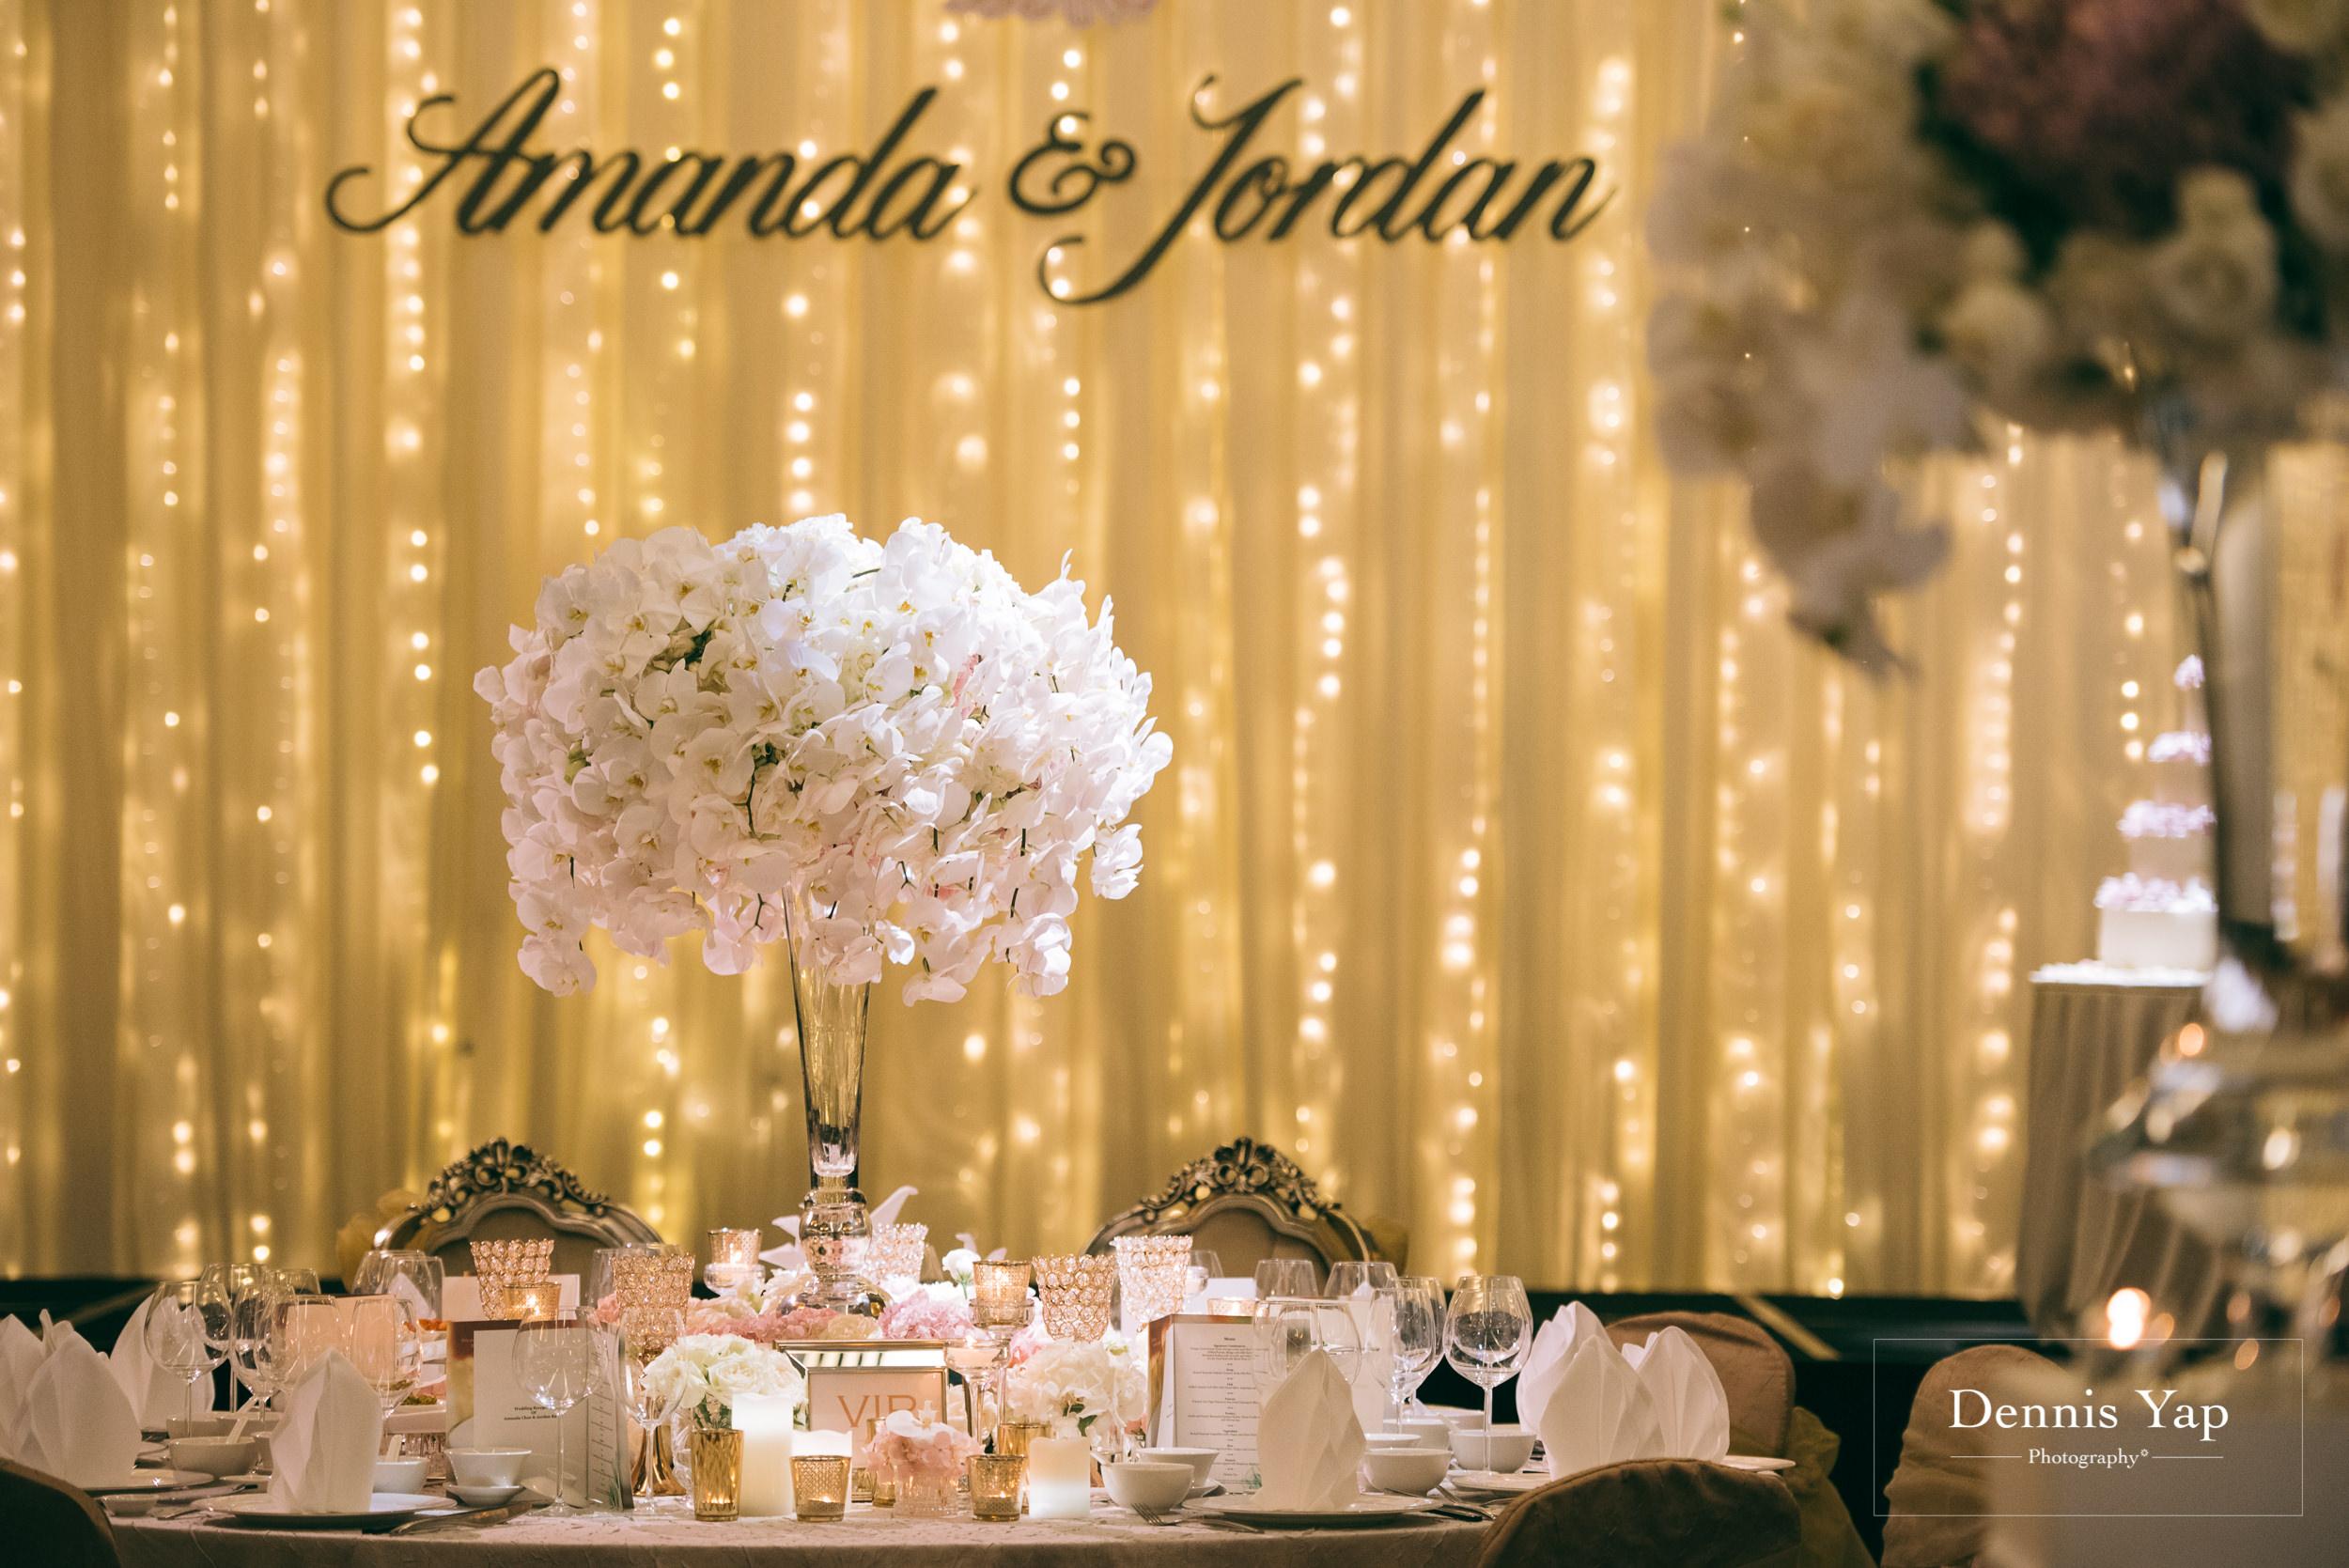 jordan amanda wedding day westin hotel kuala lumpur choe family dennis yap photography-23.jpg